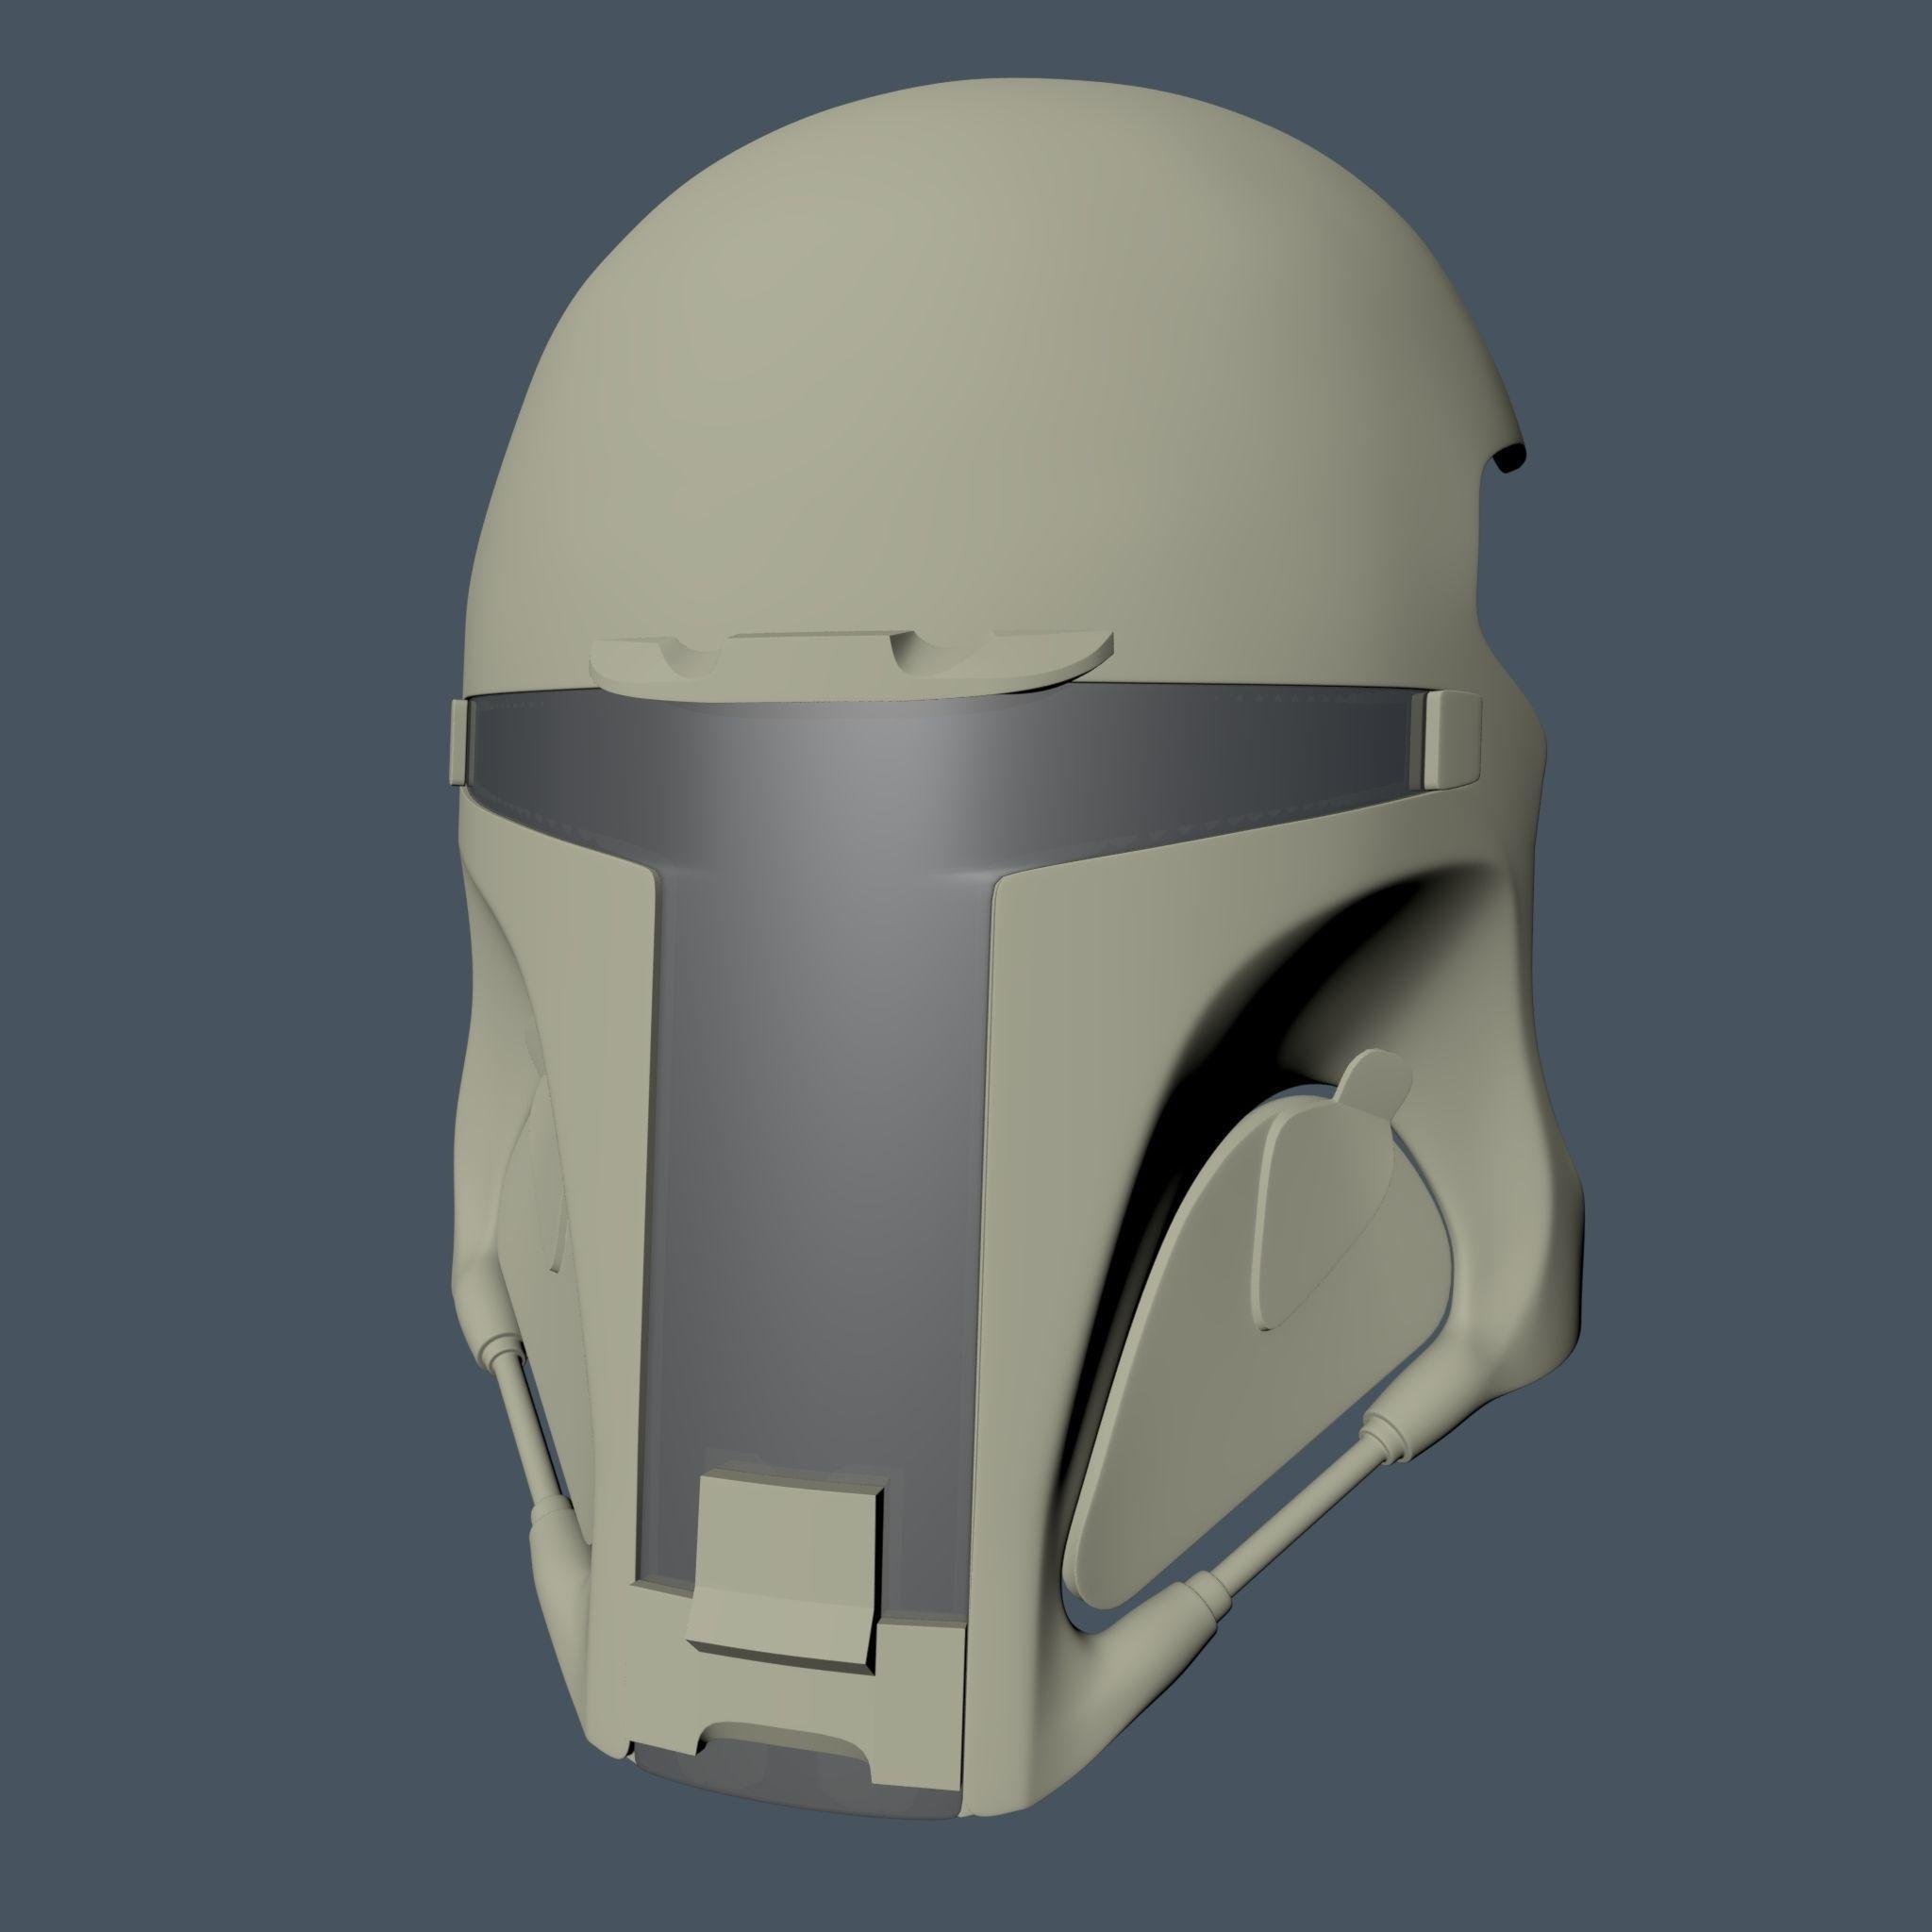 Boba Fett style airsoft visor